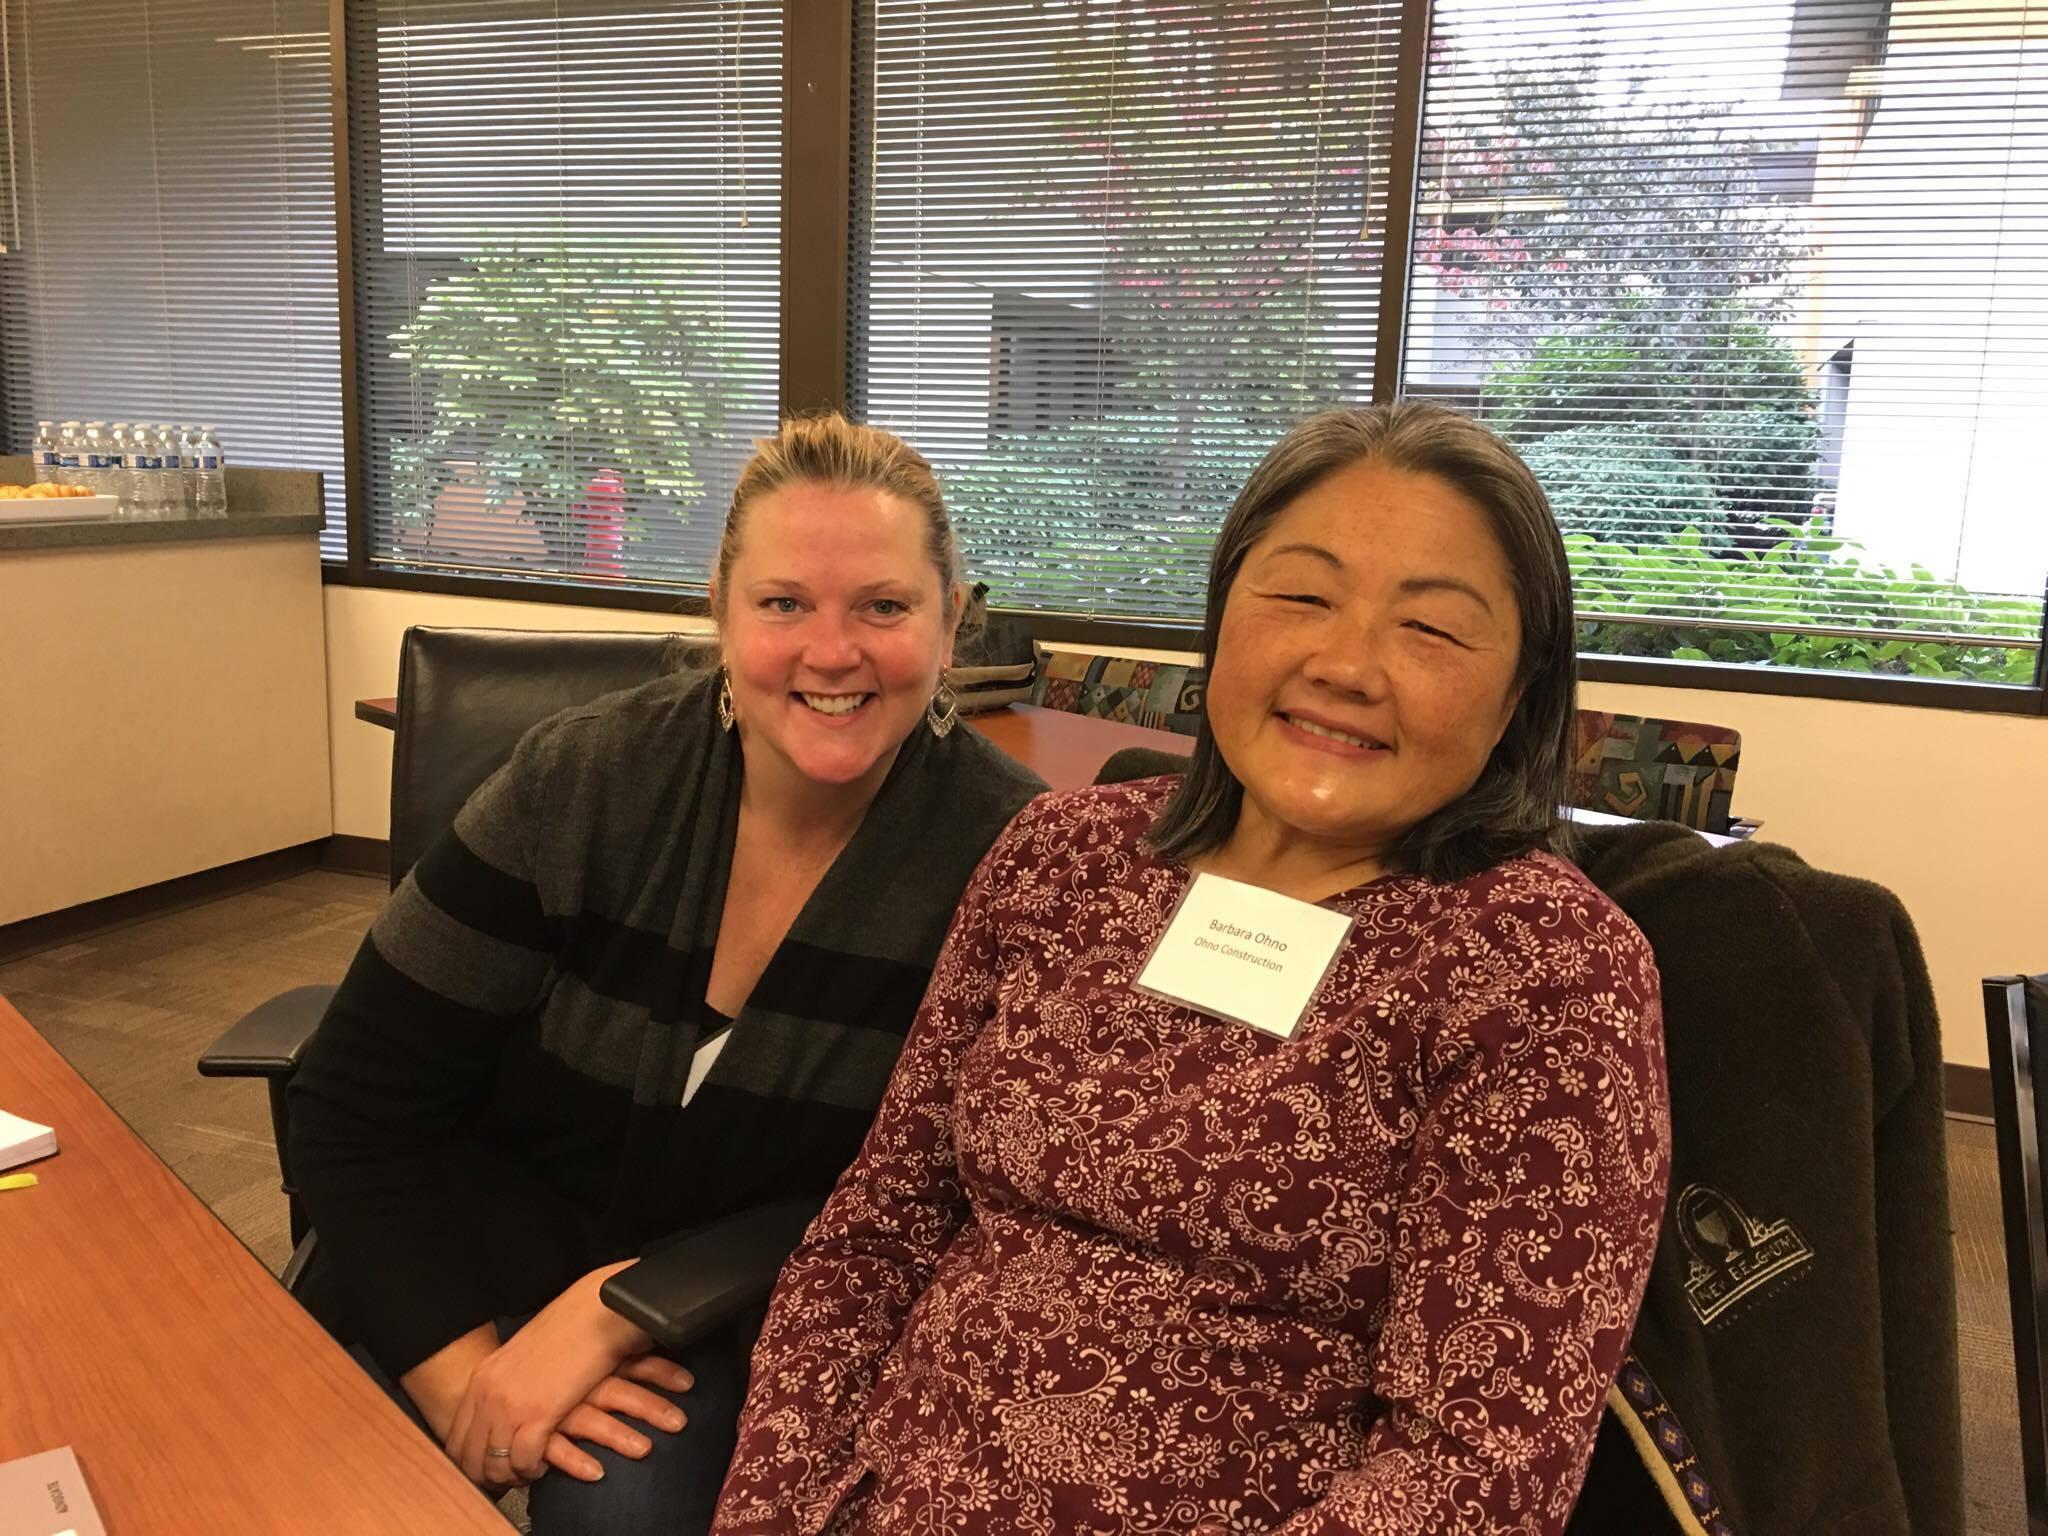 Mary Svendsen (TokuSaku Consulting) and Barbara Ohno (Ohno Construction)